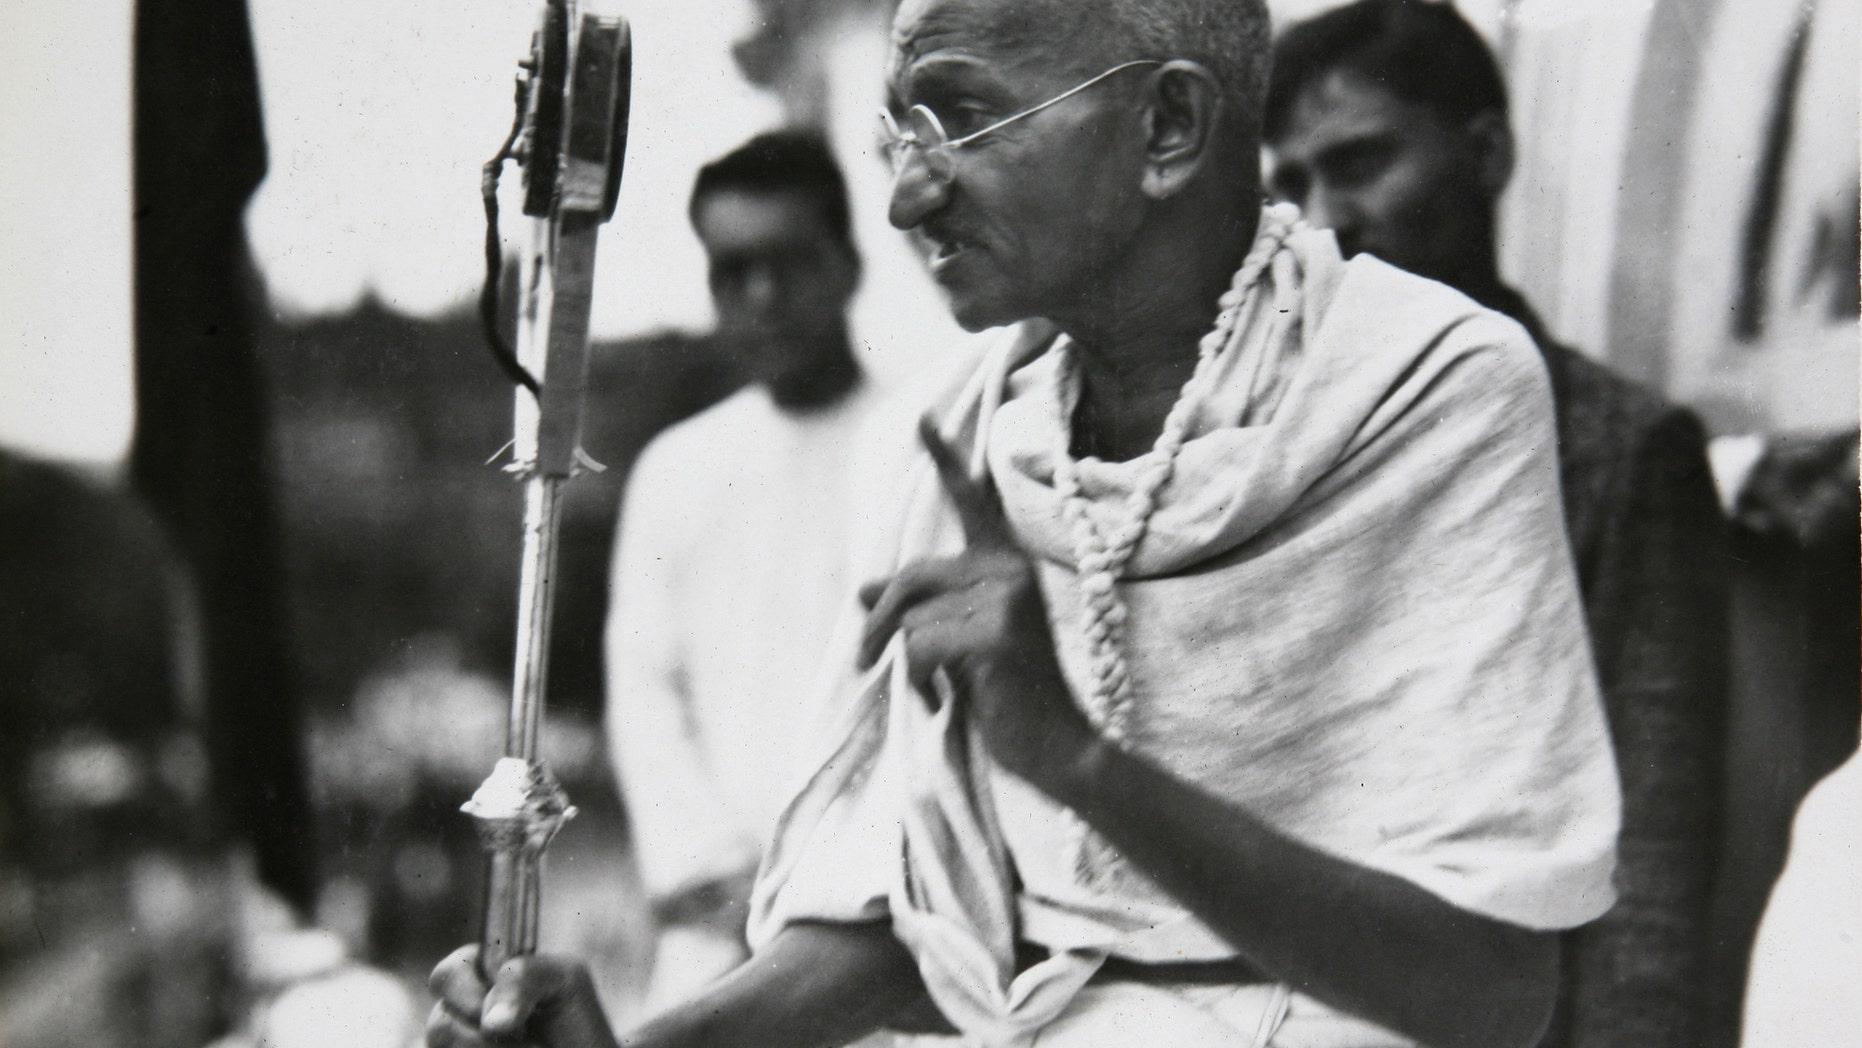 Mahatma Gandhi talks to a crowd in India in 1931.